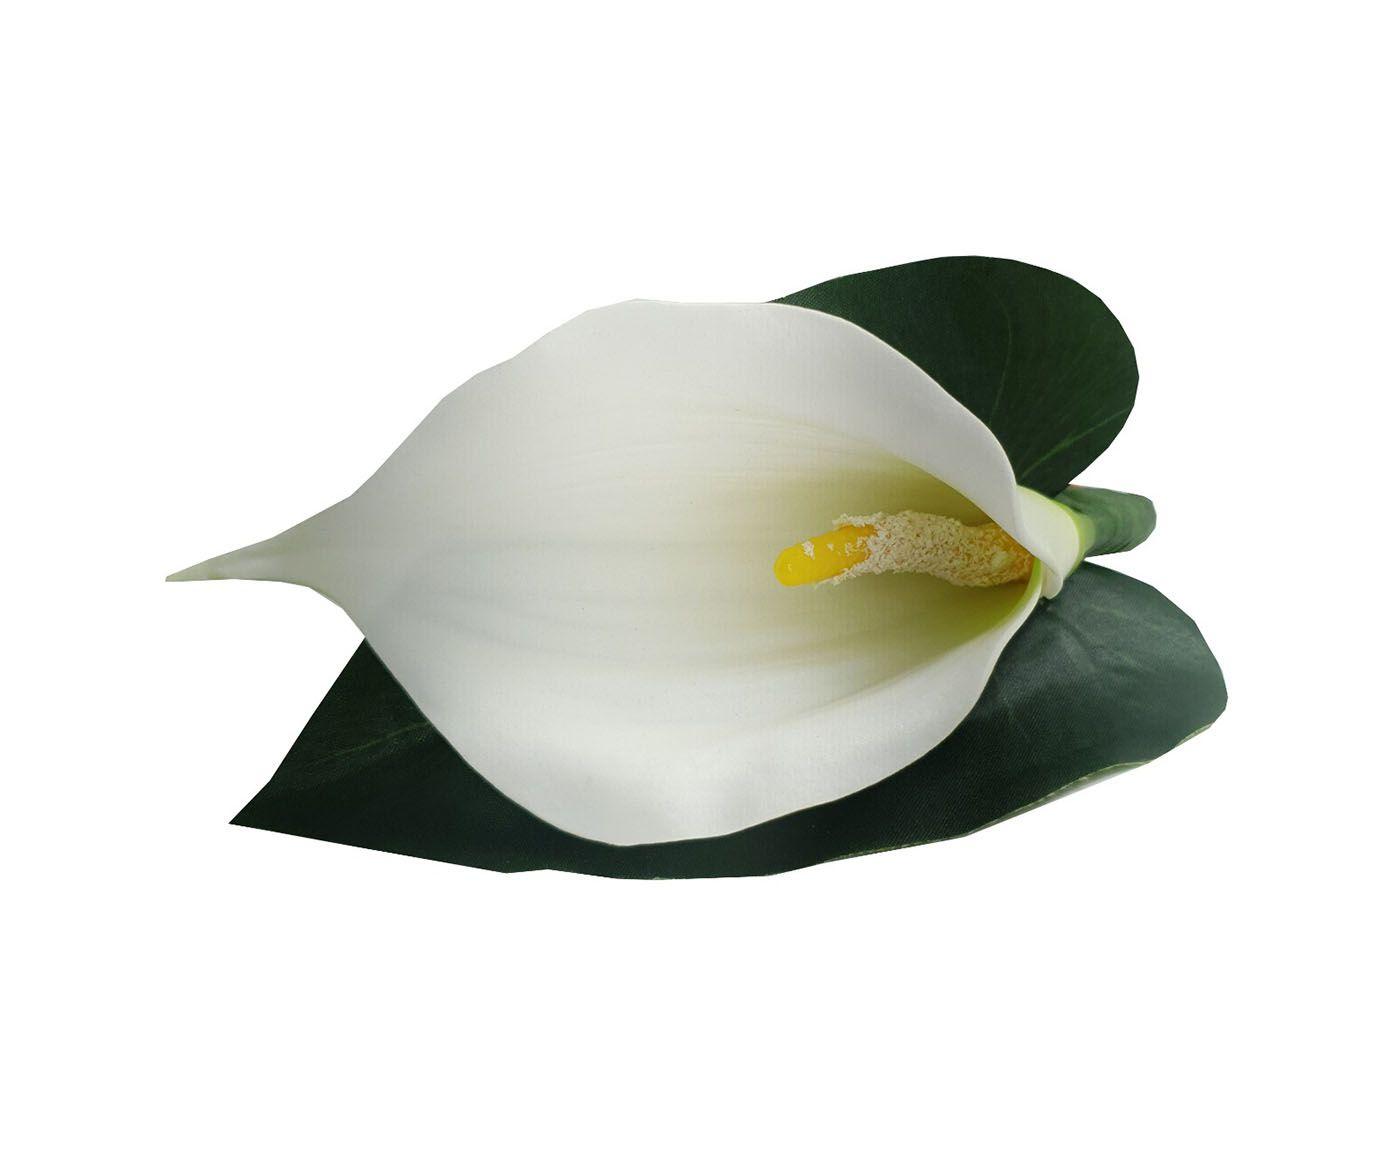 Anel para Guardanapo Copo de Leite Branco - 12X6cm   Westwing.com.br